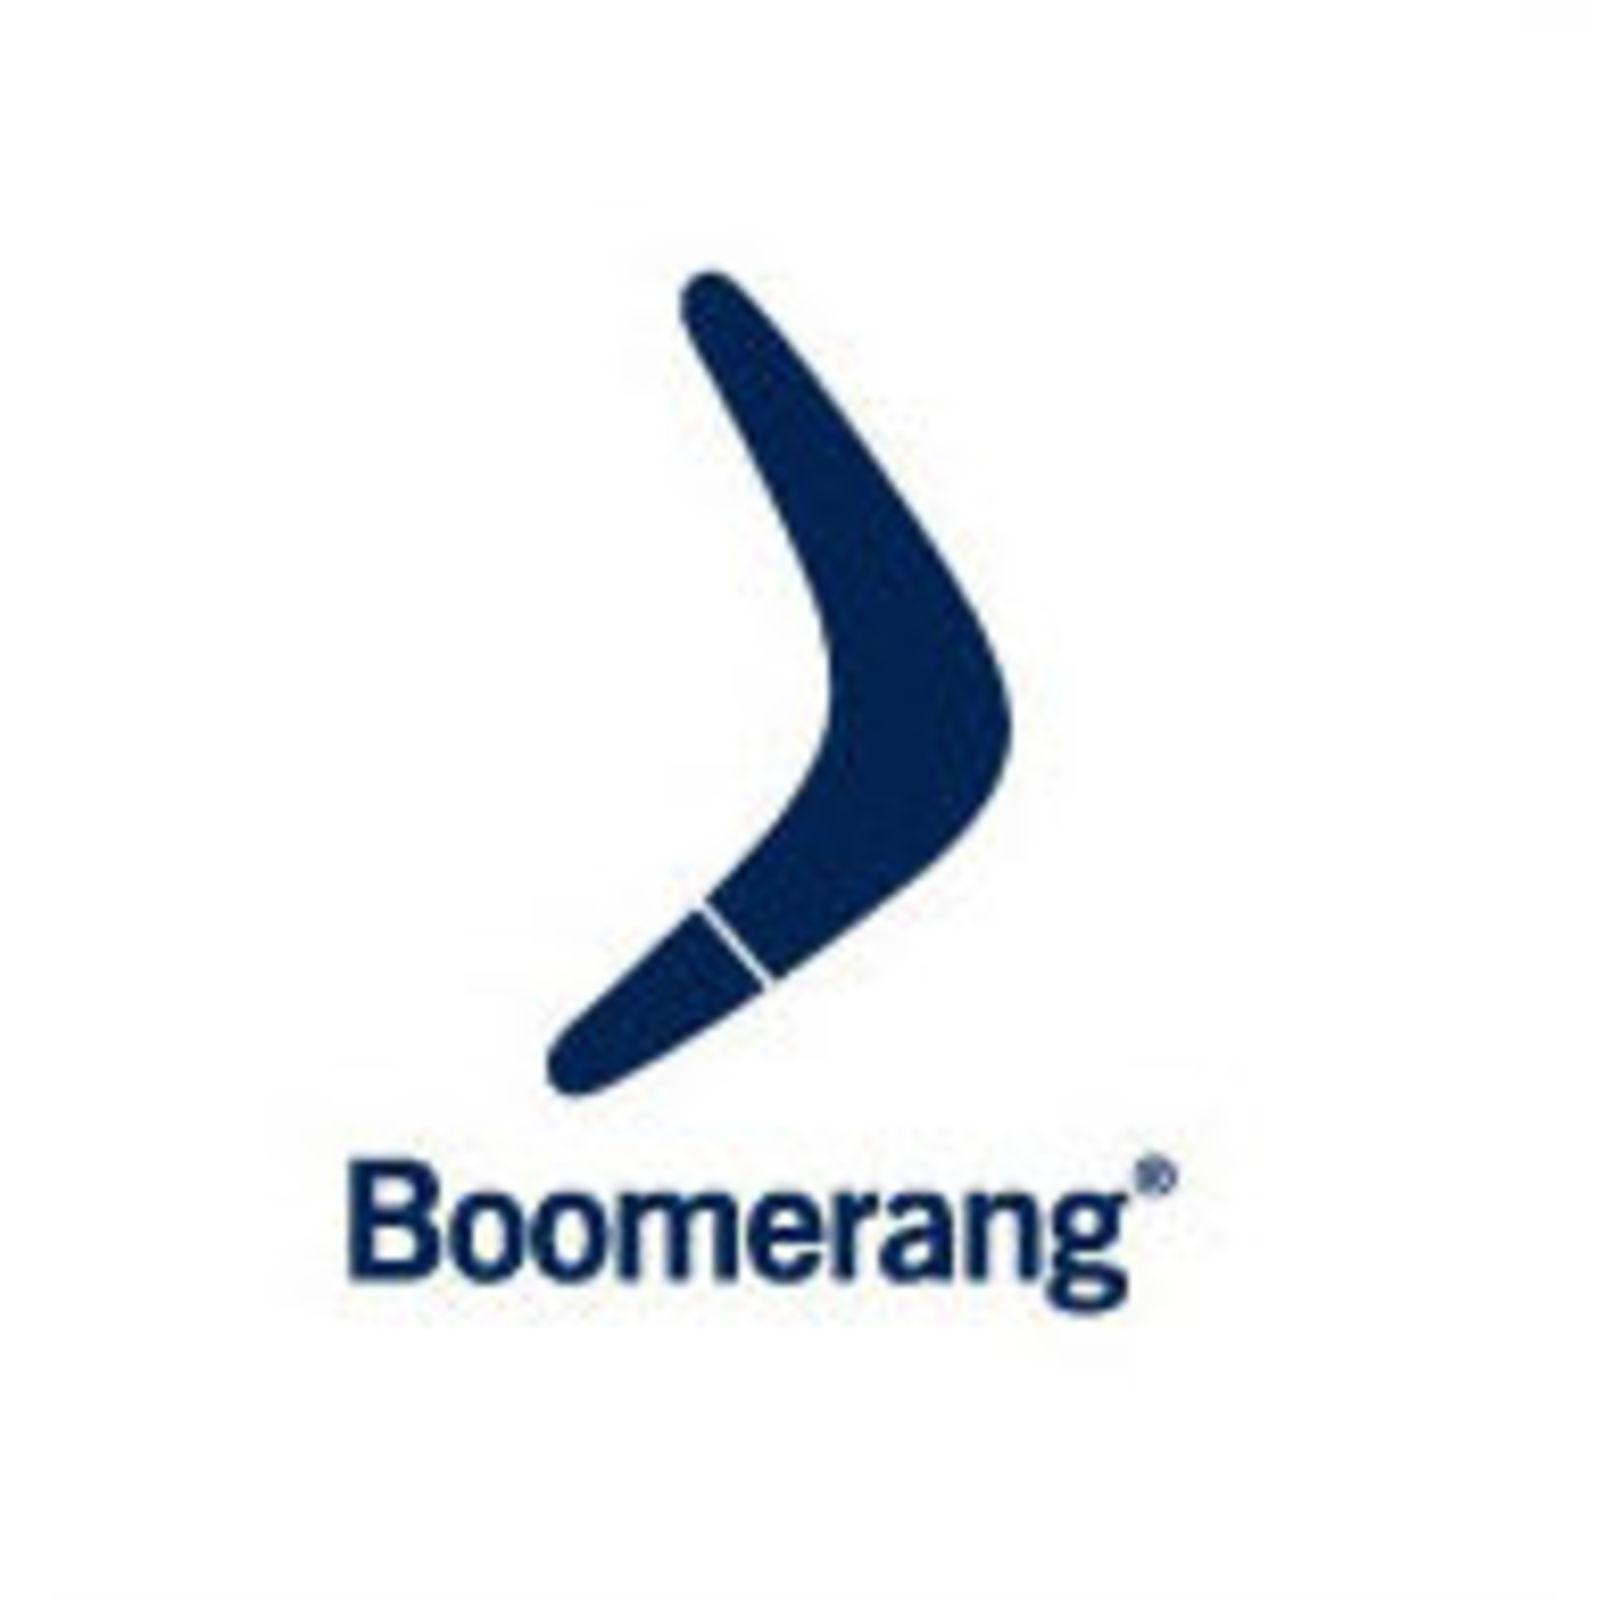 Boomerang (Bild 1)